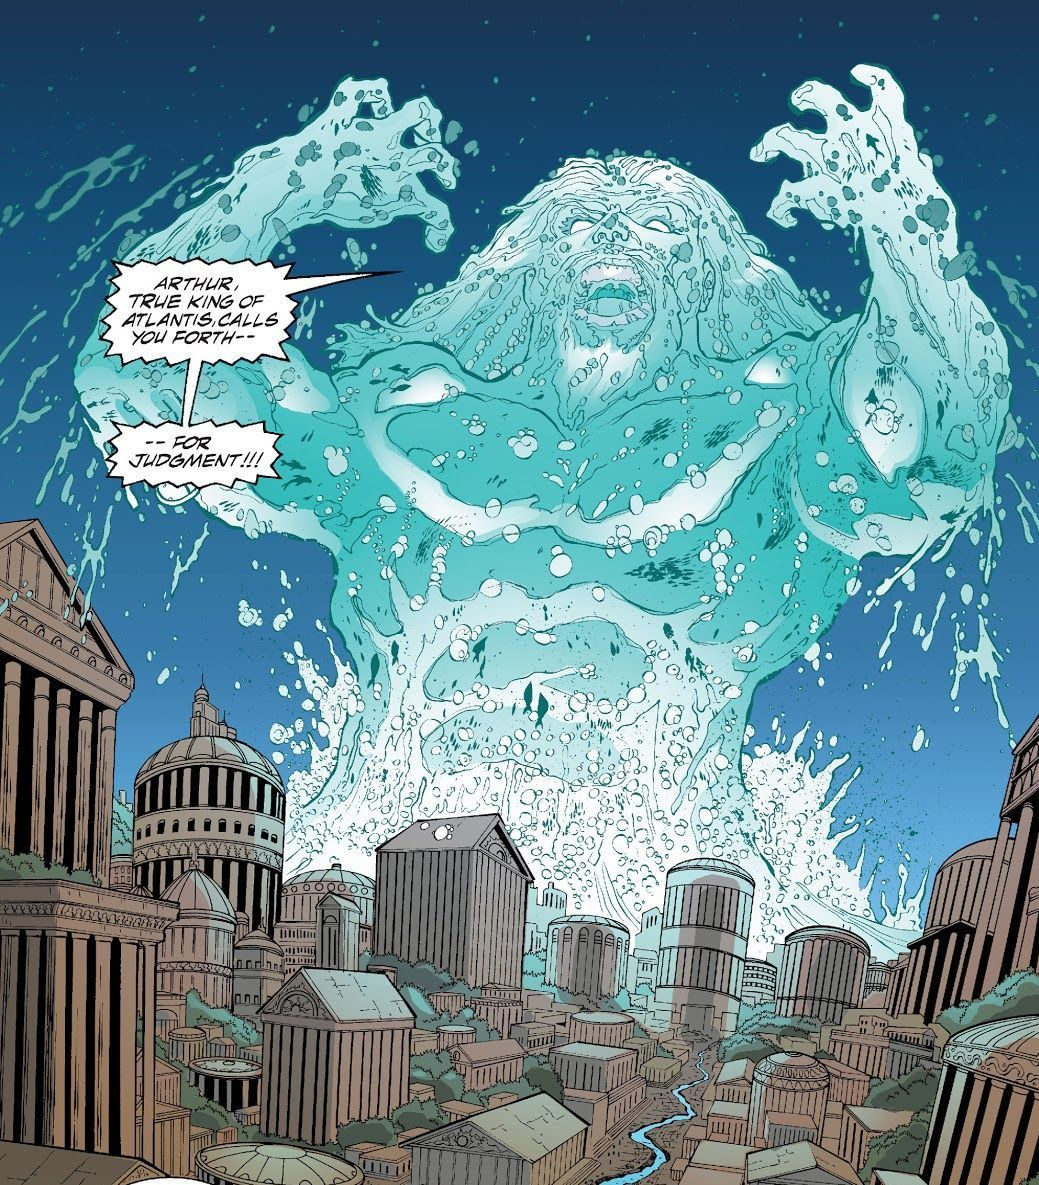 JLA #75, written by Joe Kelly with art by Doung Mahnke, Yvel Guichet, Darryl Banks and Deitrich Smith.